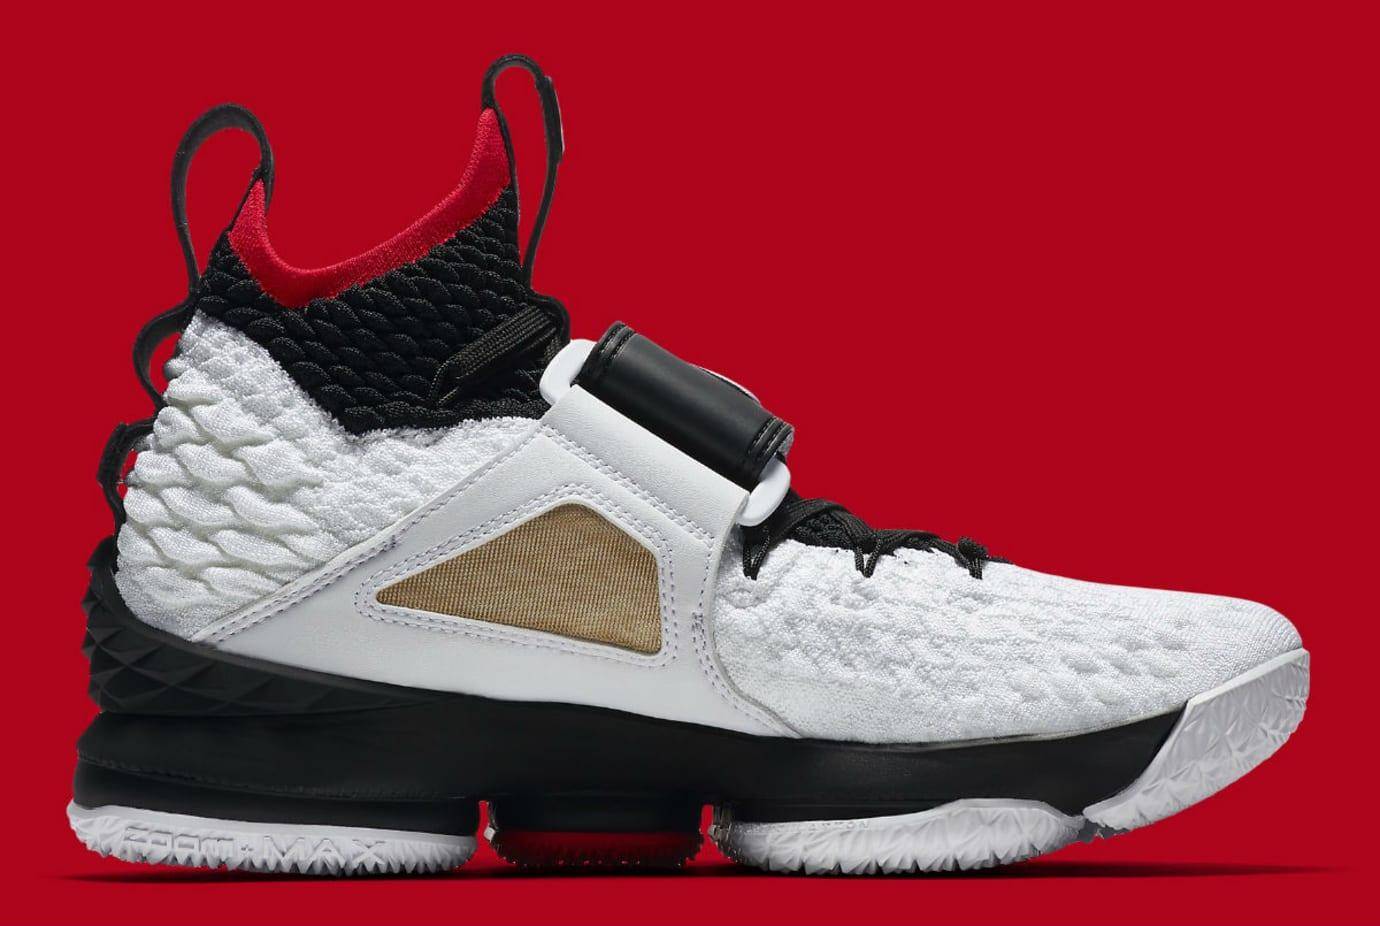 quality design 2c711 bc318 Nike LeBron 15 Diamond Turf Deion Sanders Release Date ...